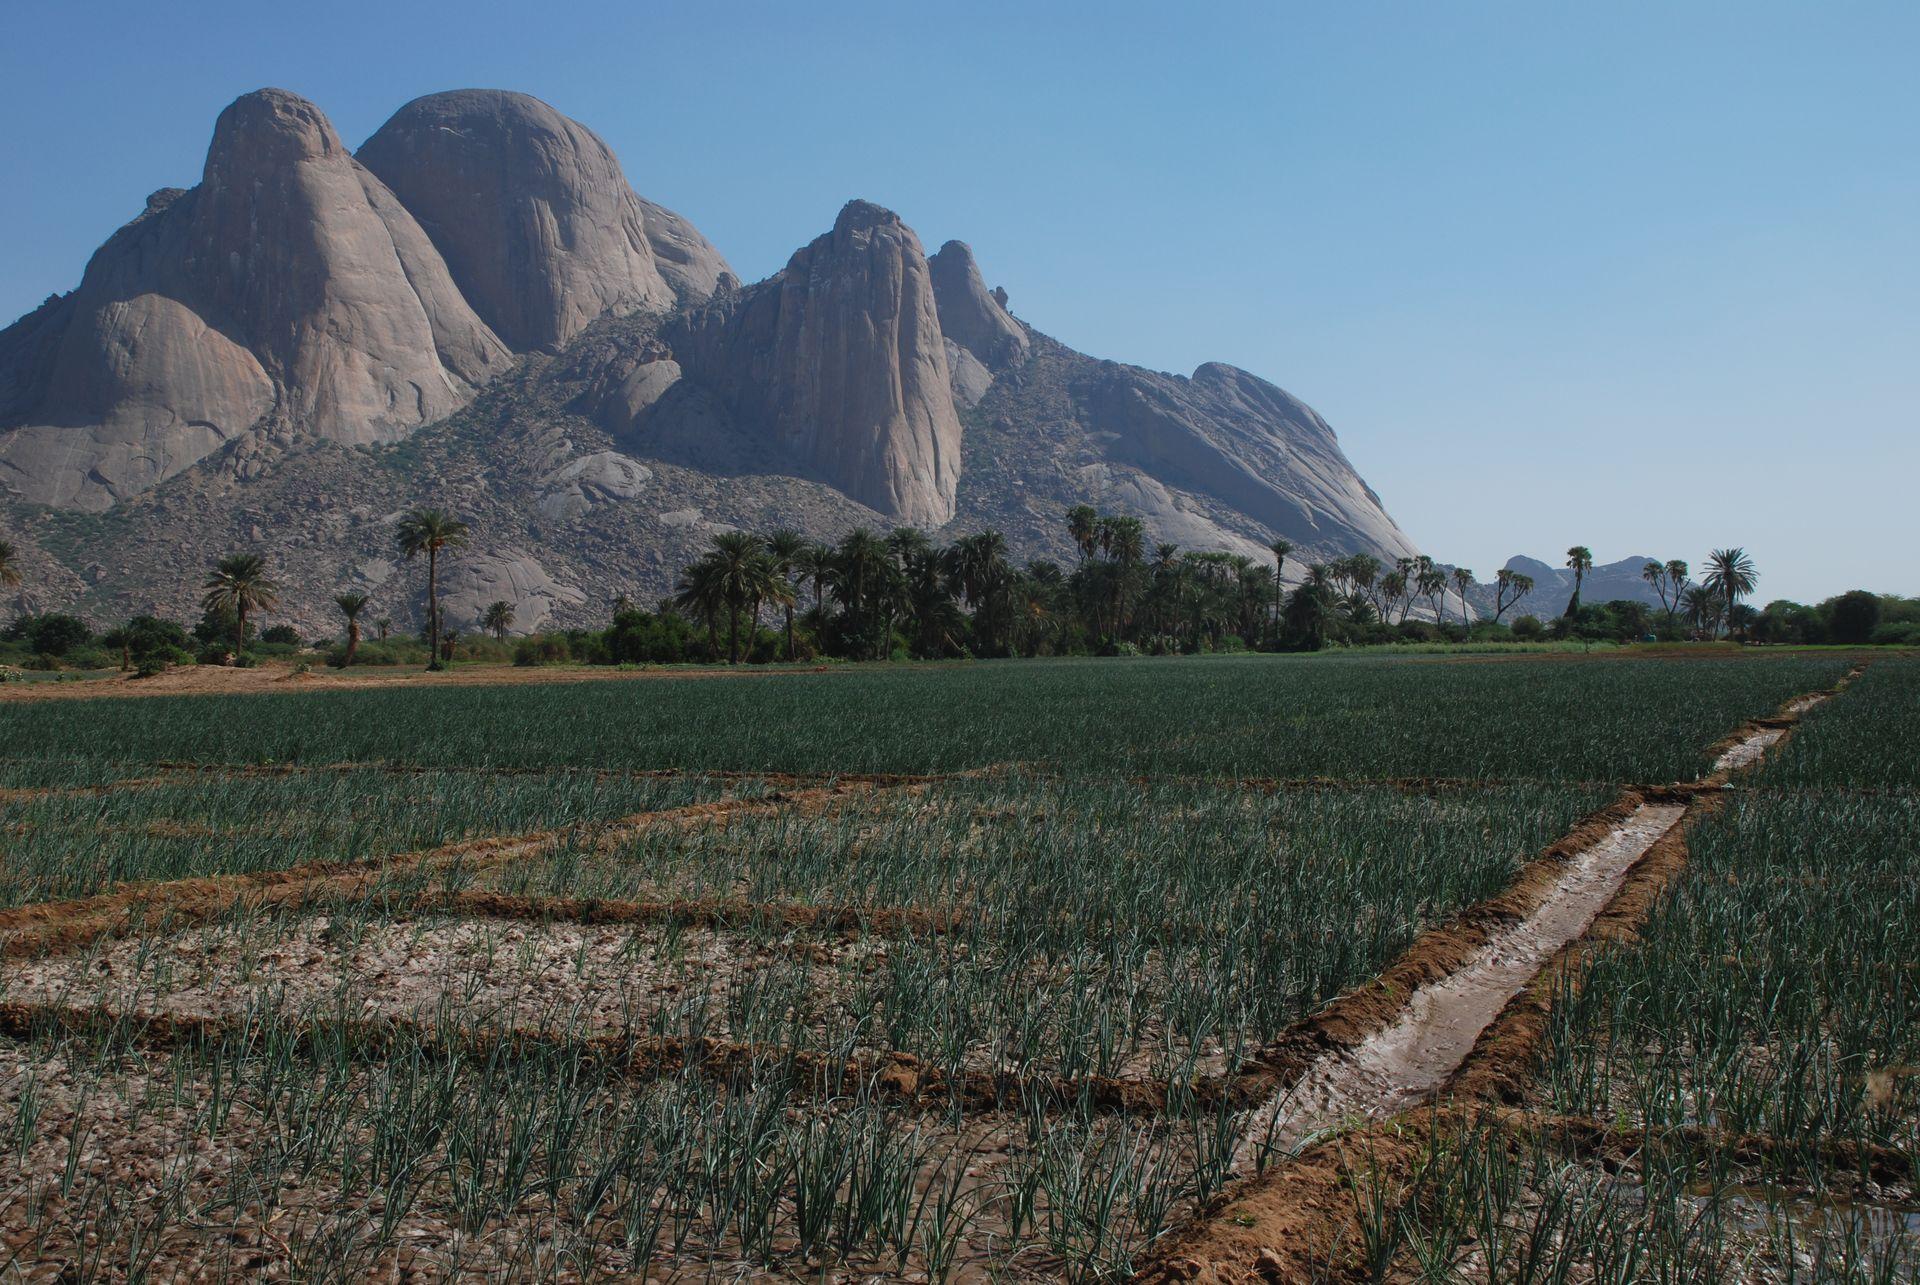 Champs d'oignons, Kassala, Soudan. Photo : Bertramz, Wikipédia.